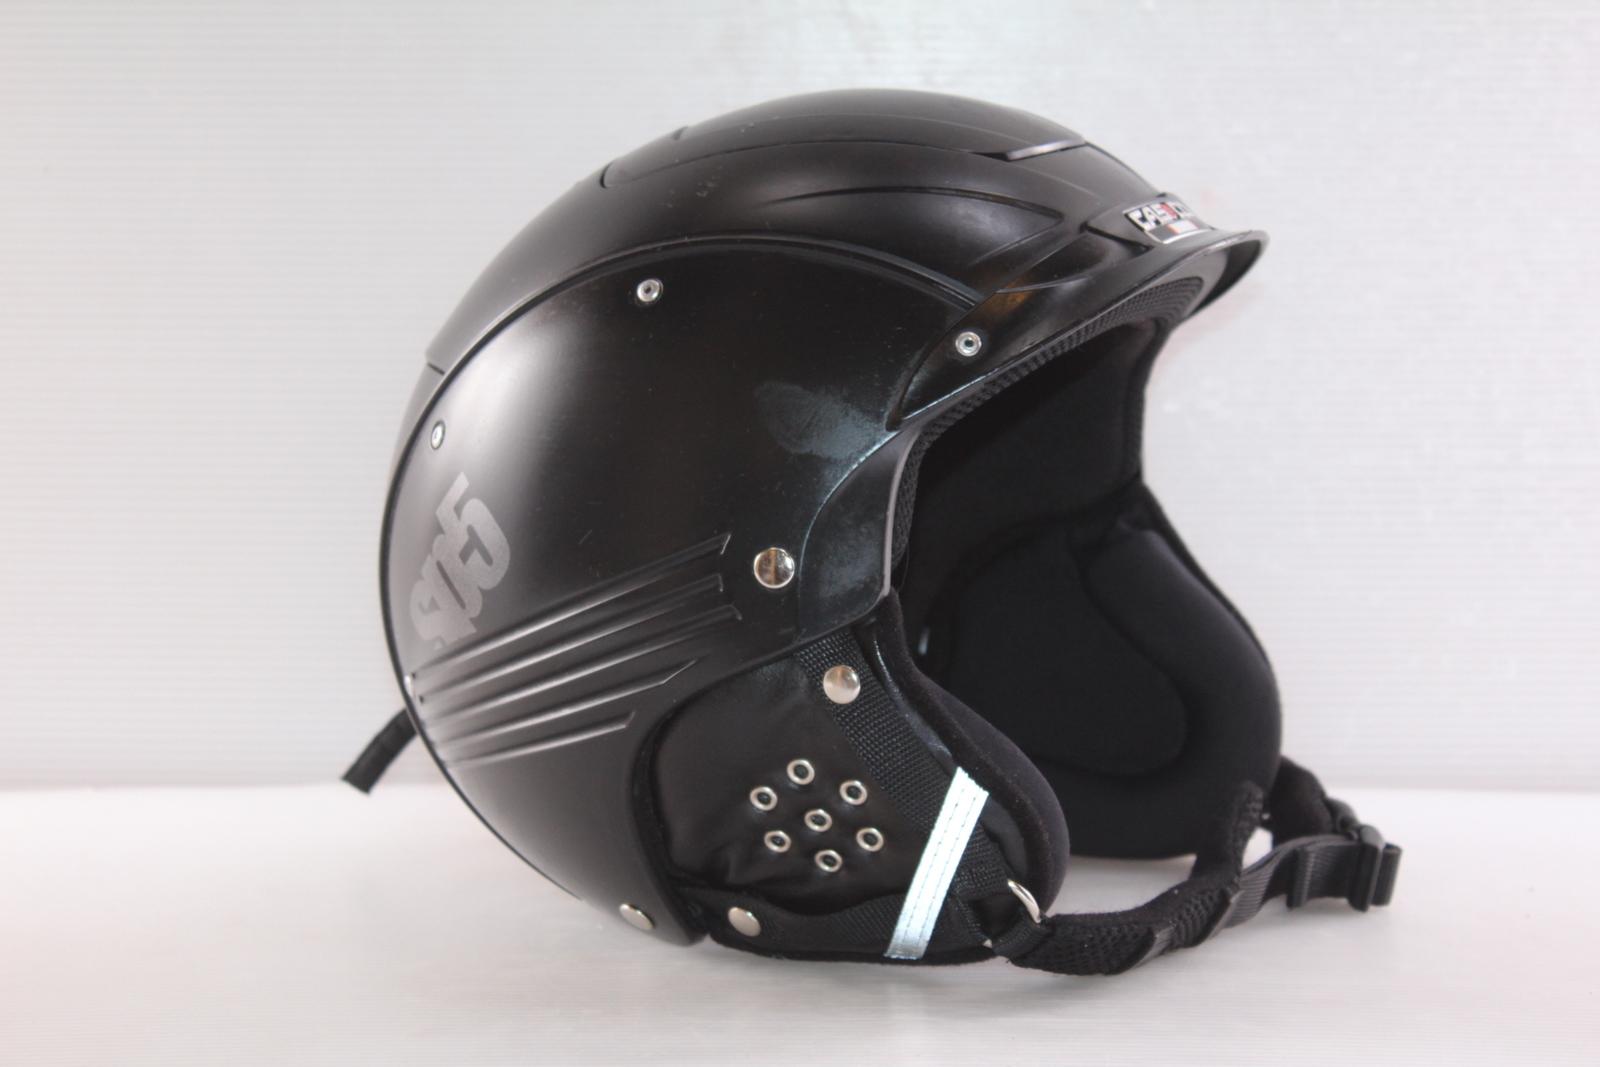 Dámská lyžařská helma Casco SP5 - posuvná vel. 54 - 58